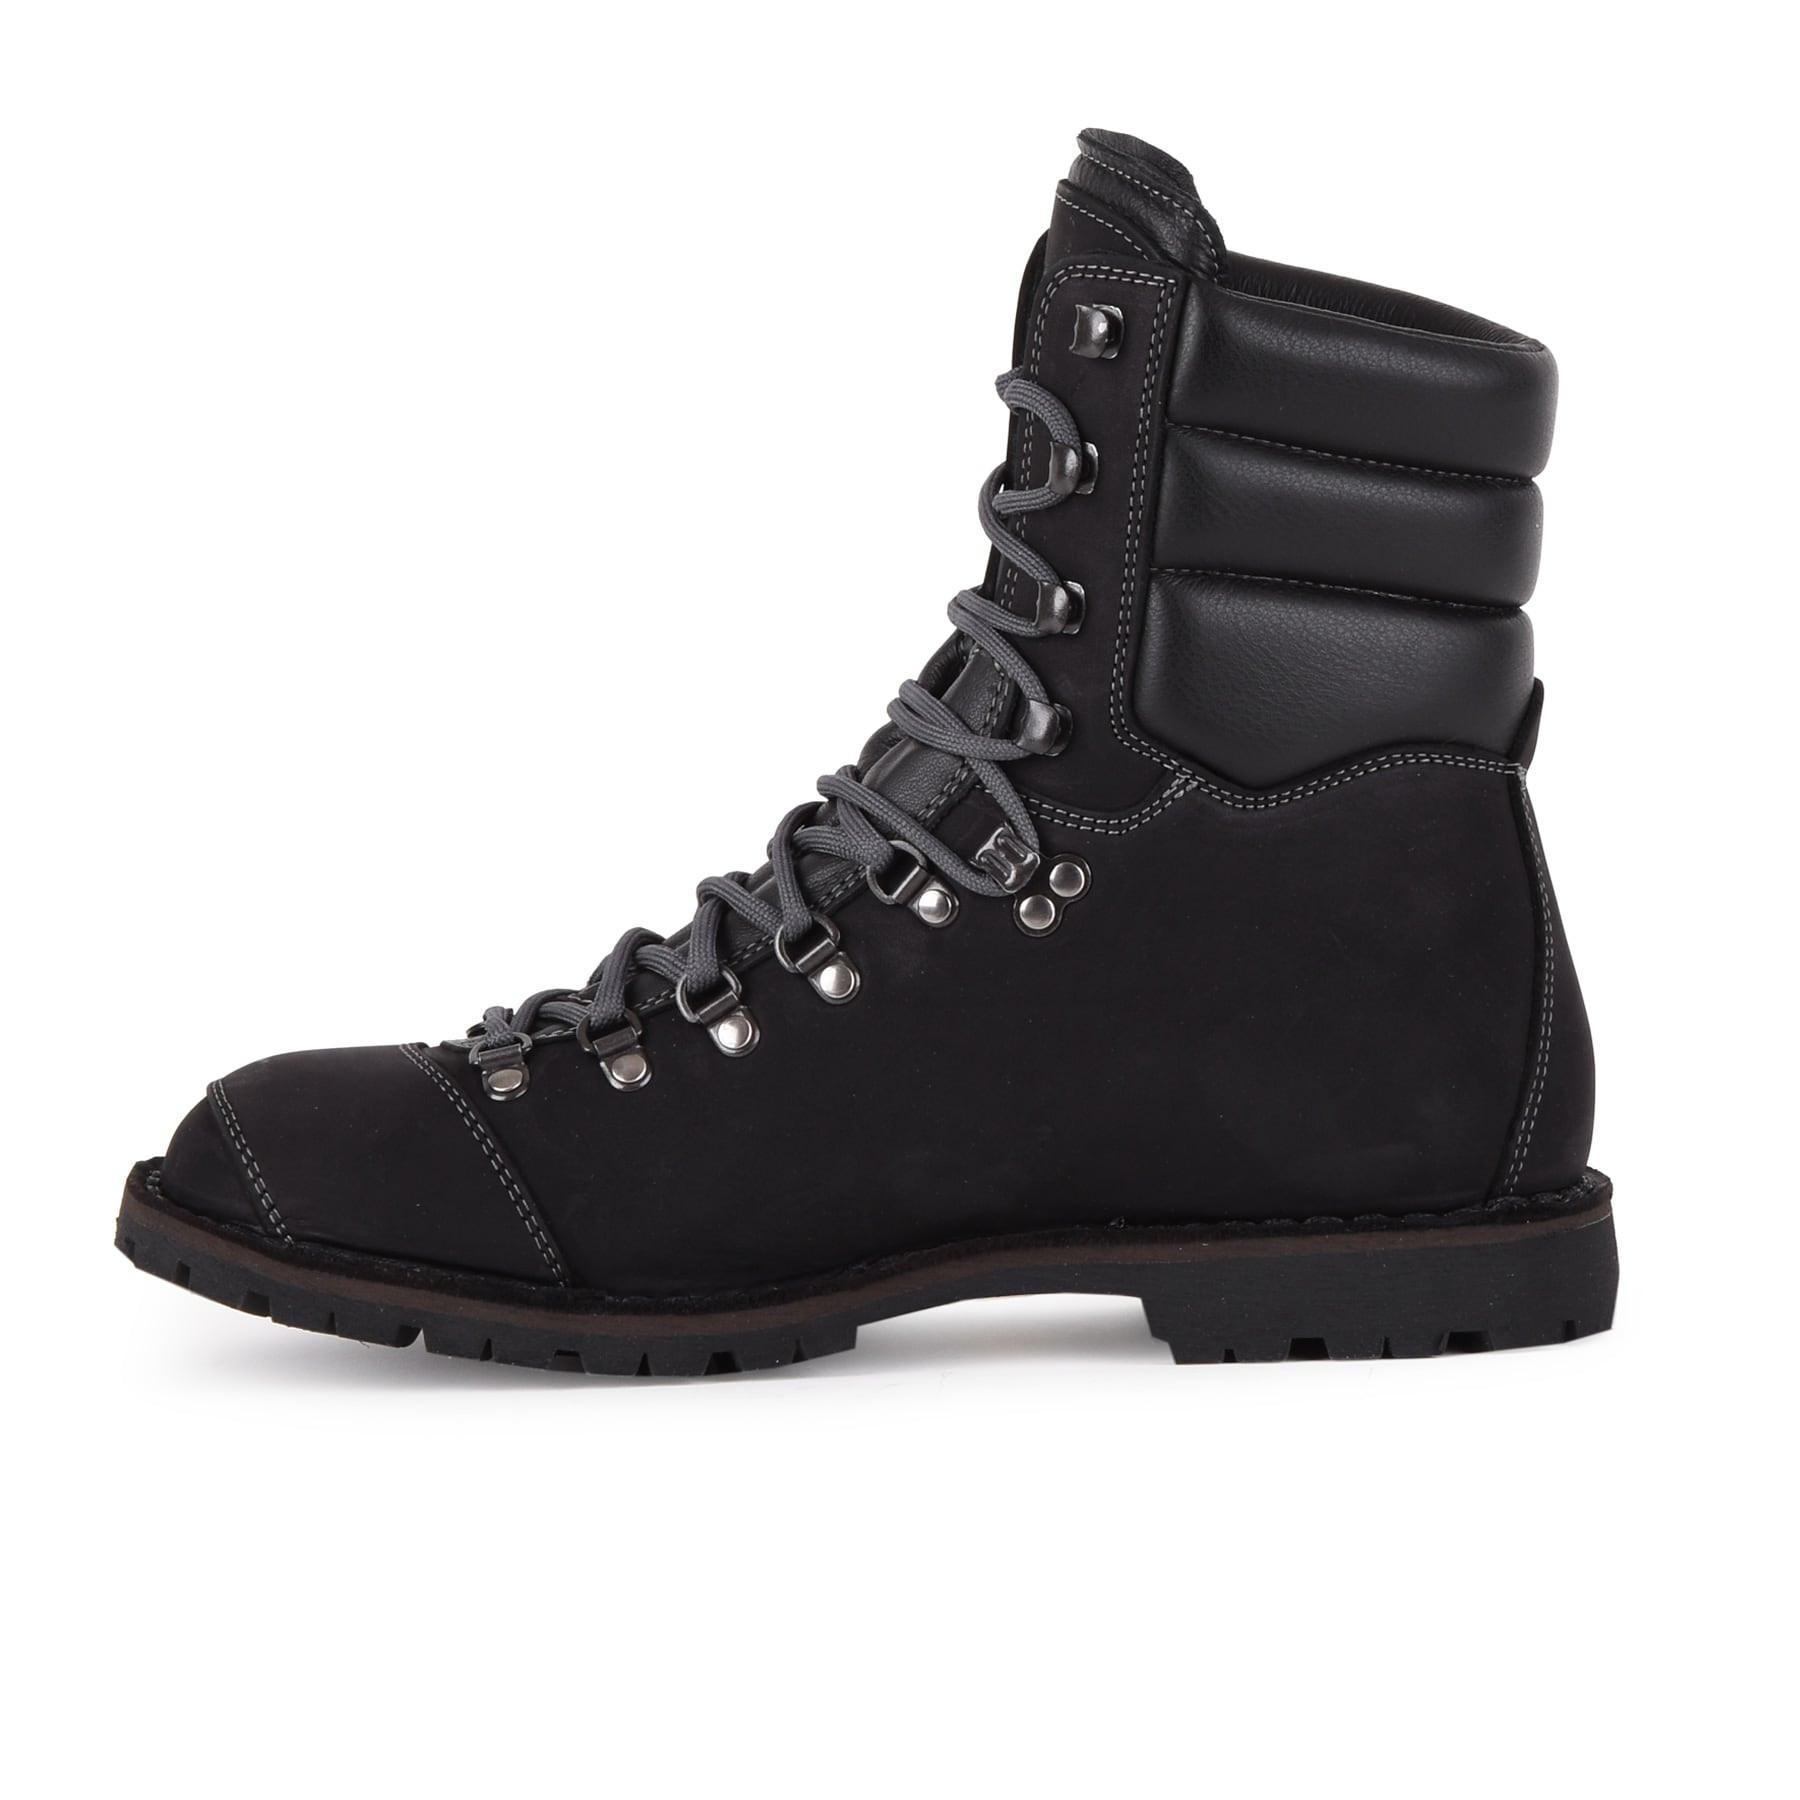 Biker Boot AdventureSE Denver Black, schwarzer Herren Stiefel, graue Nähte